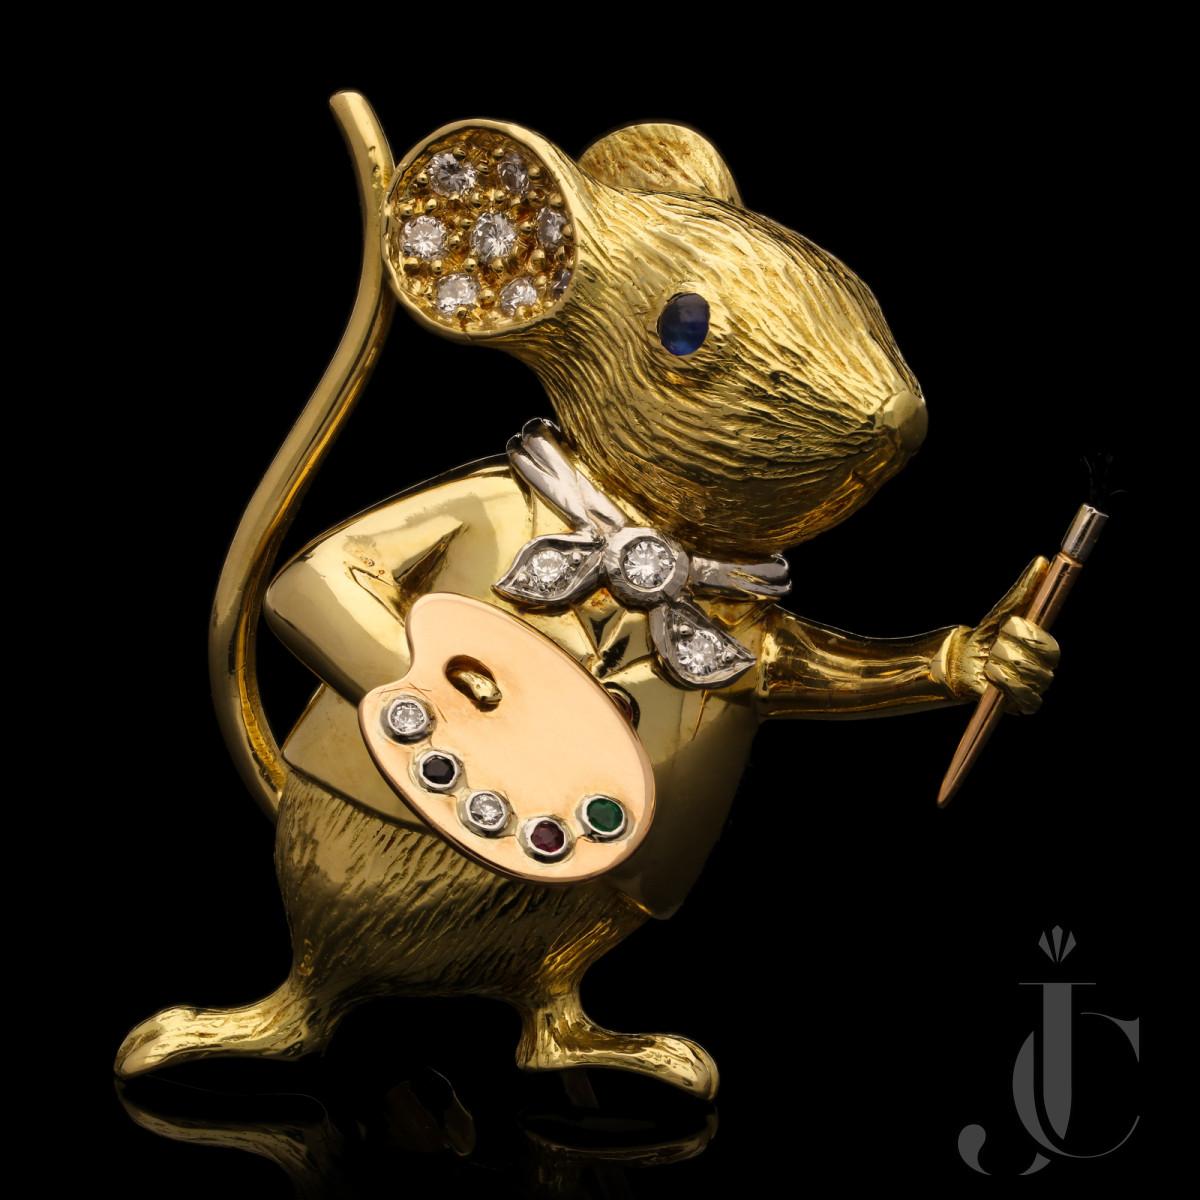 E Wolfe - Diamond & gem Artist Mouse brooch c1990